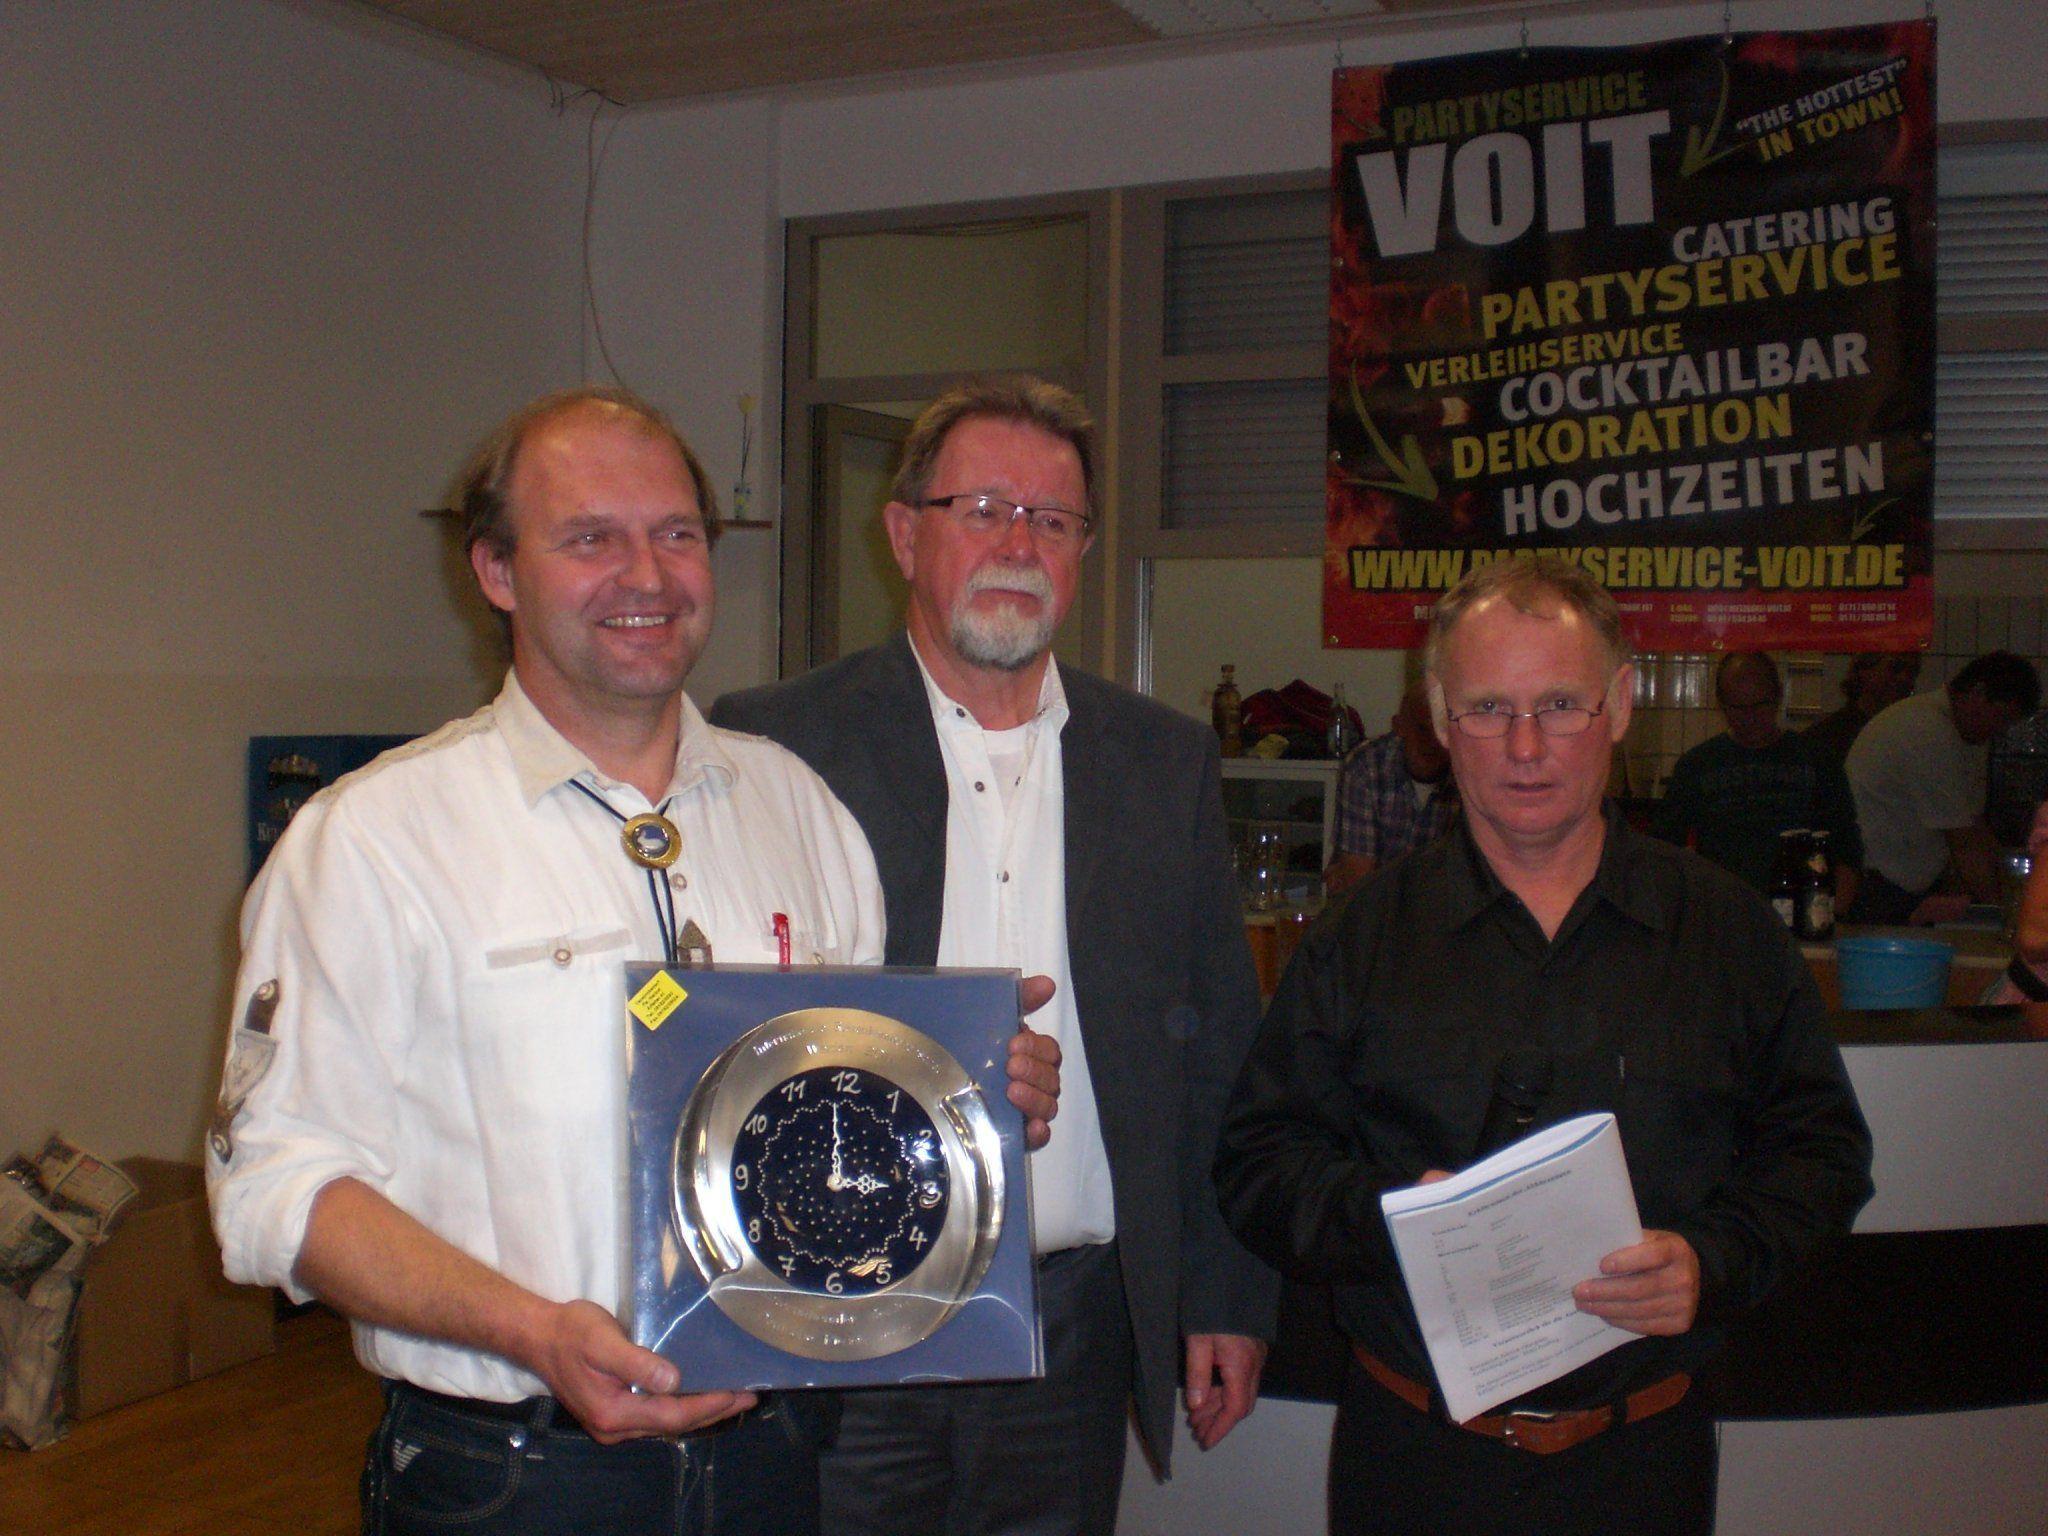 Siegerehrung 100 jährigen Riesenclubschau in Bayern, v.l.n.r. Martin Wachter, H. Henn, H. Prüfling